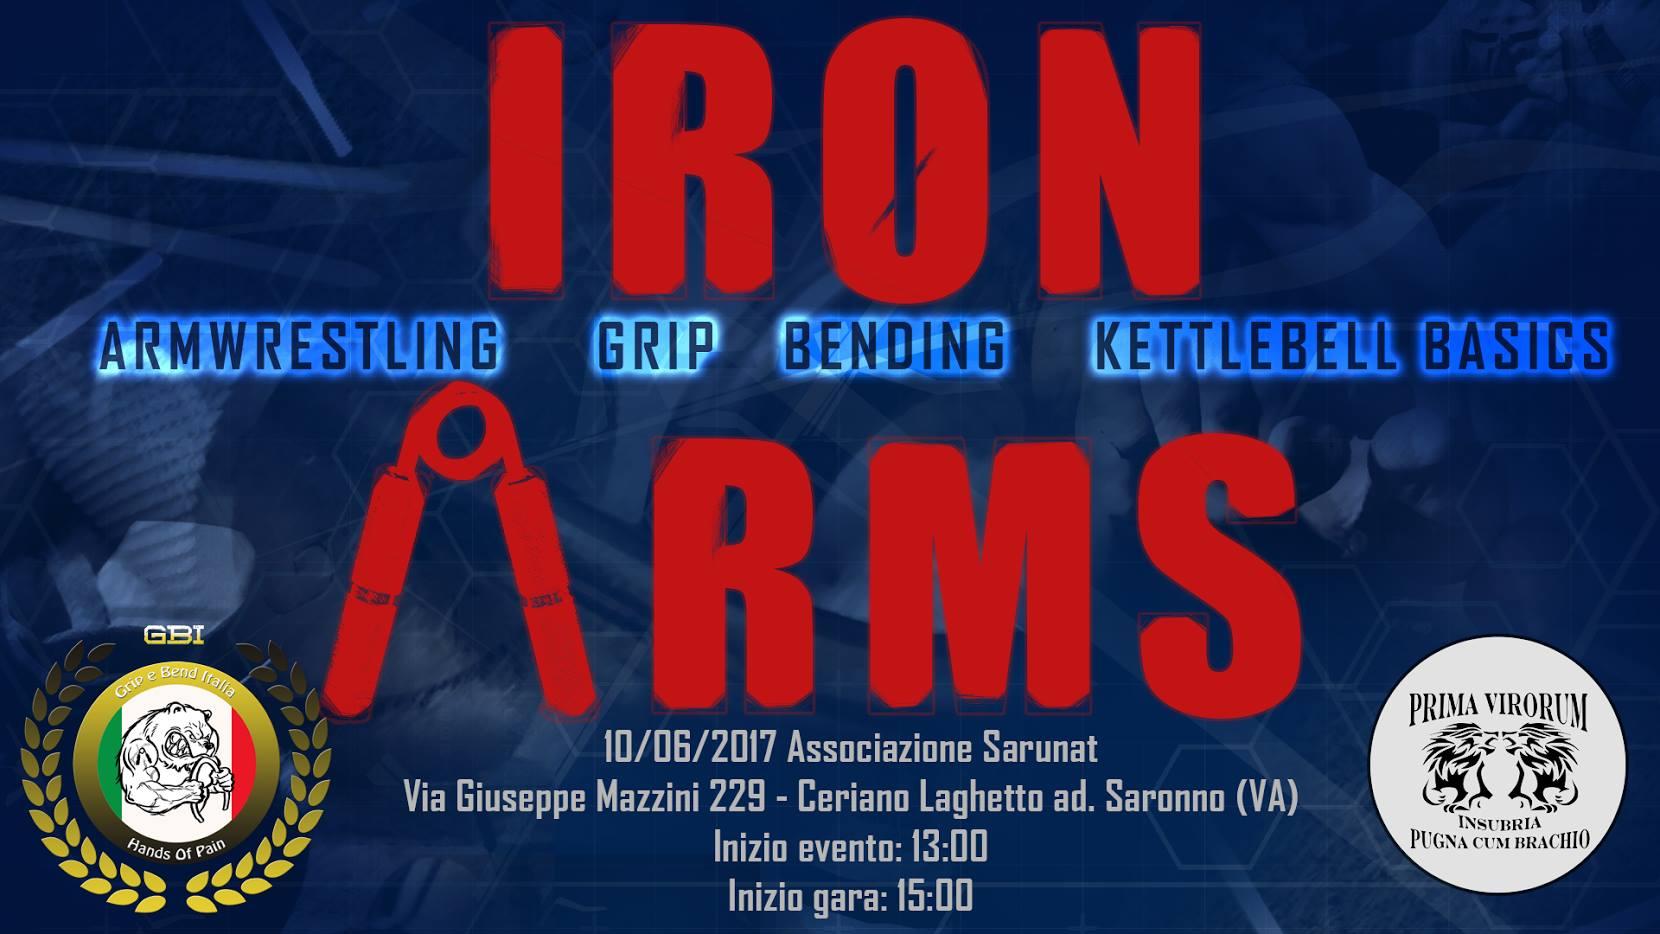 Trofeo IRON ARMS